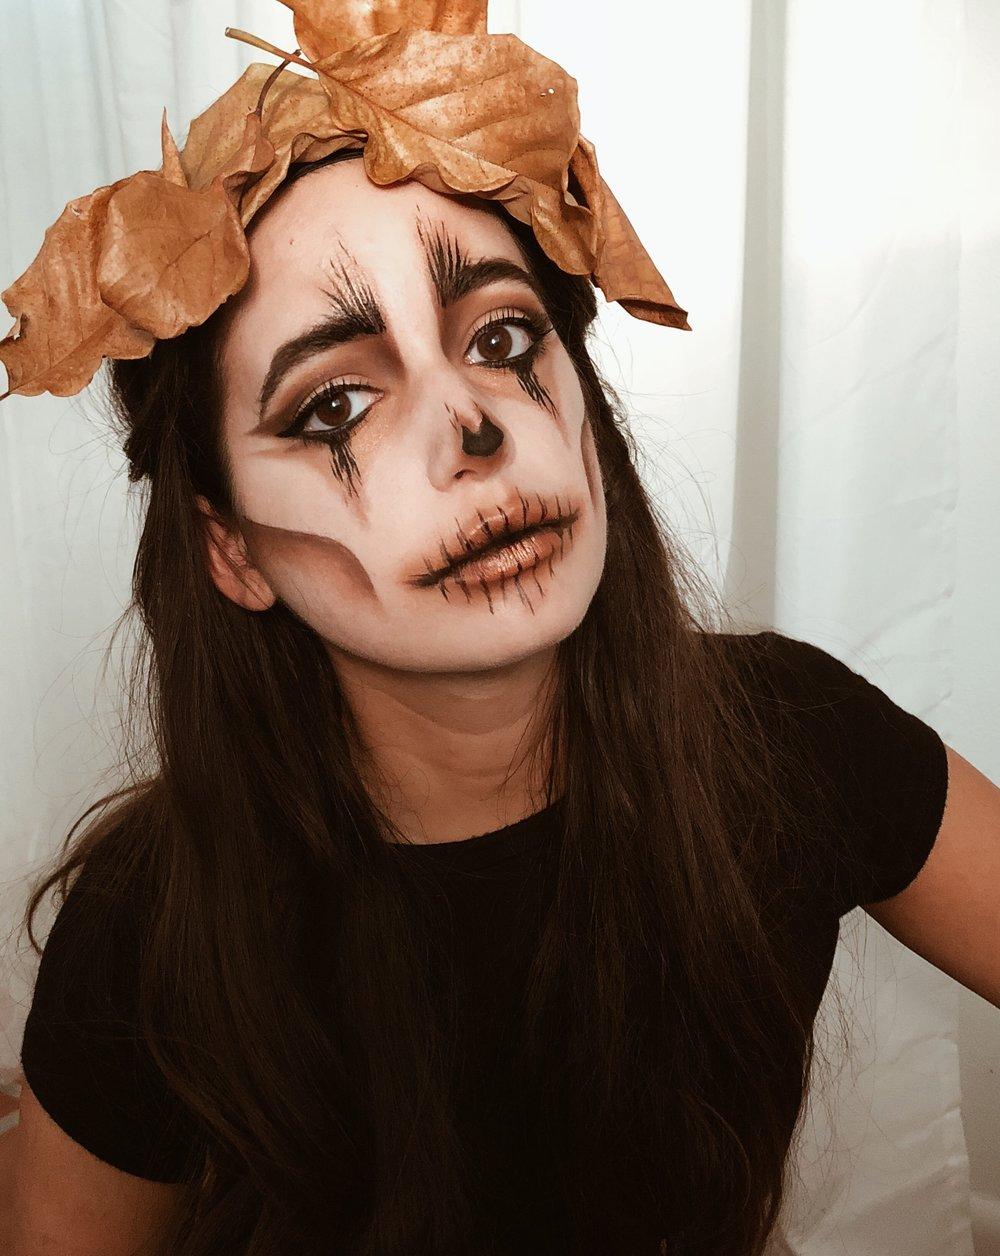 halloween-makeup-pumpkin-spice-editorial-mua-diy-costume-cosplay-tutorial-sfx-gypsy-glam